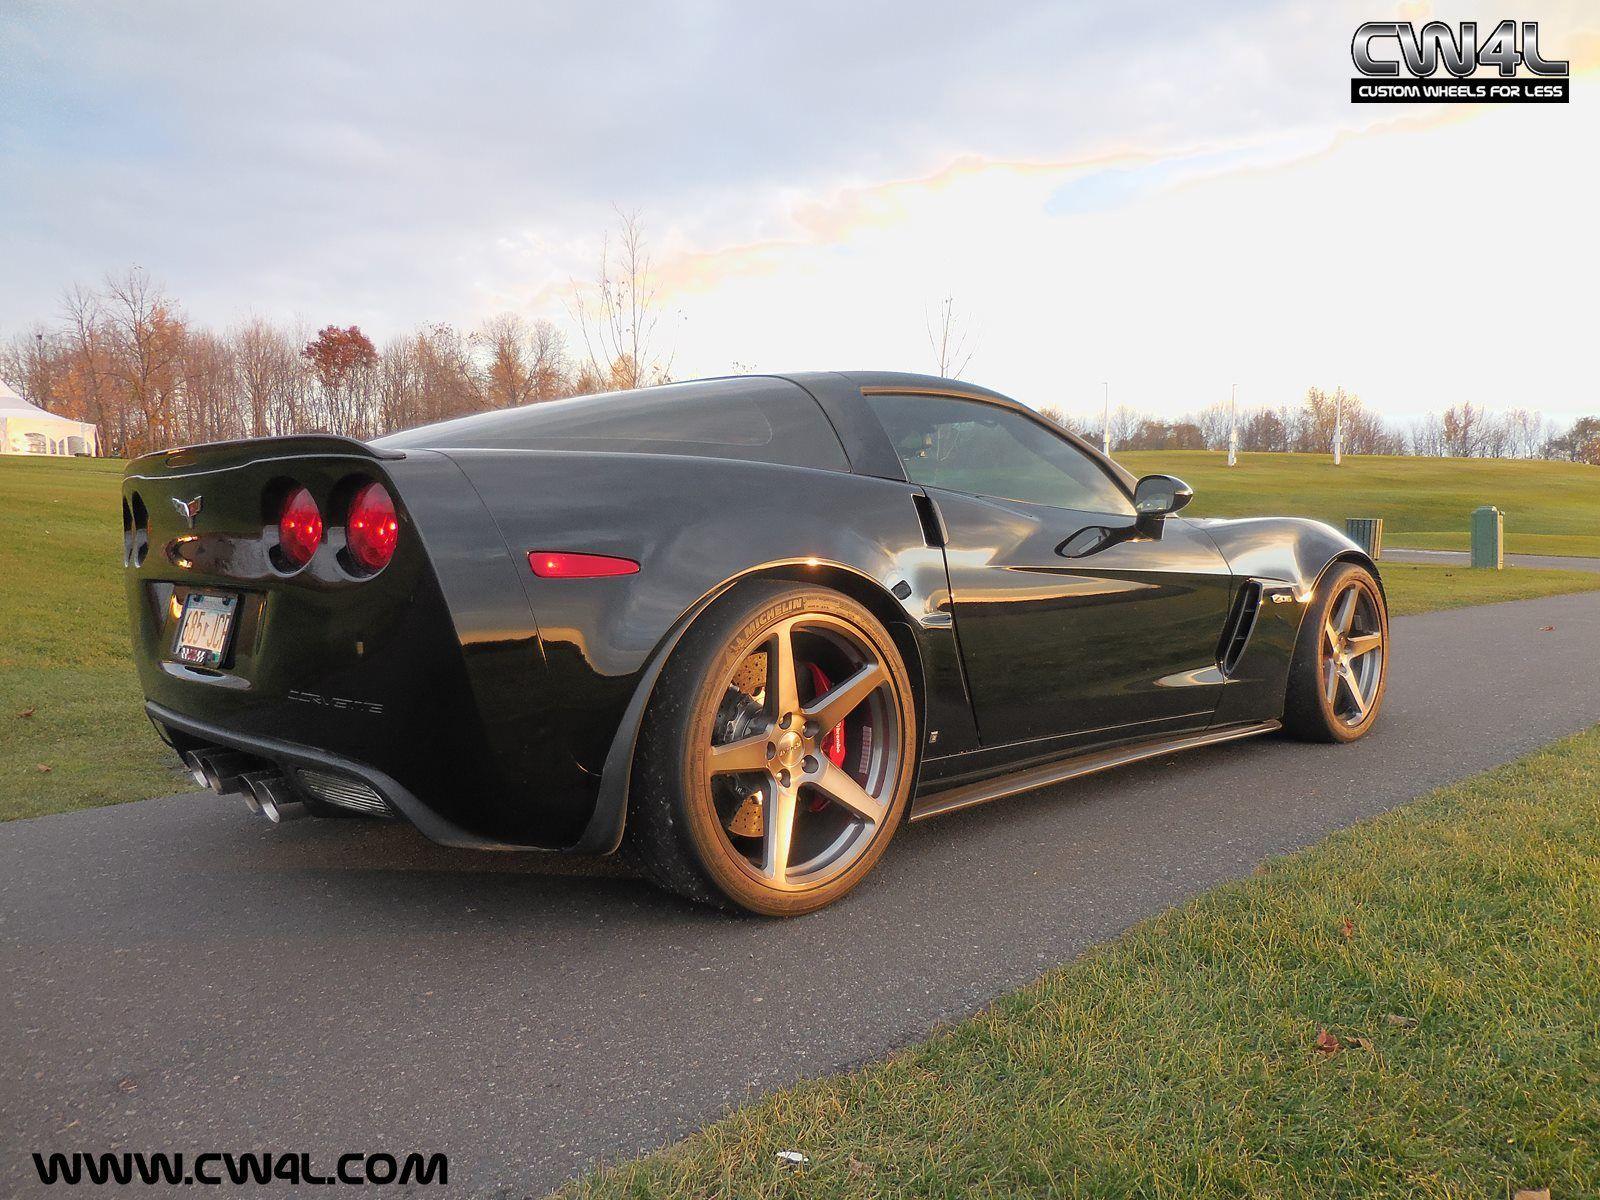 2013 Chevrolet Corvette Z06 | C6 Corvette Z06 on Forgeline One Piece Forged Monoblock CF1 Wheels